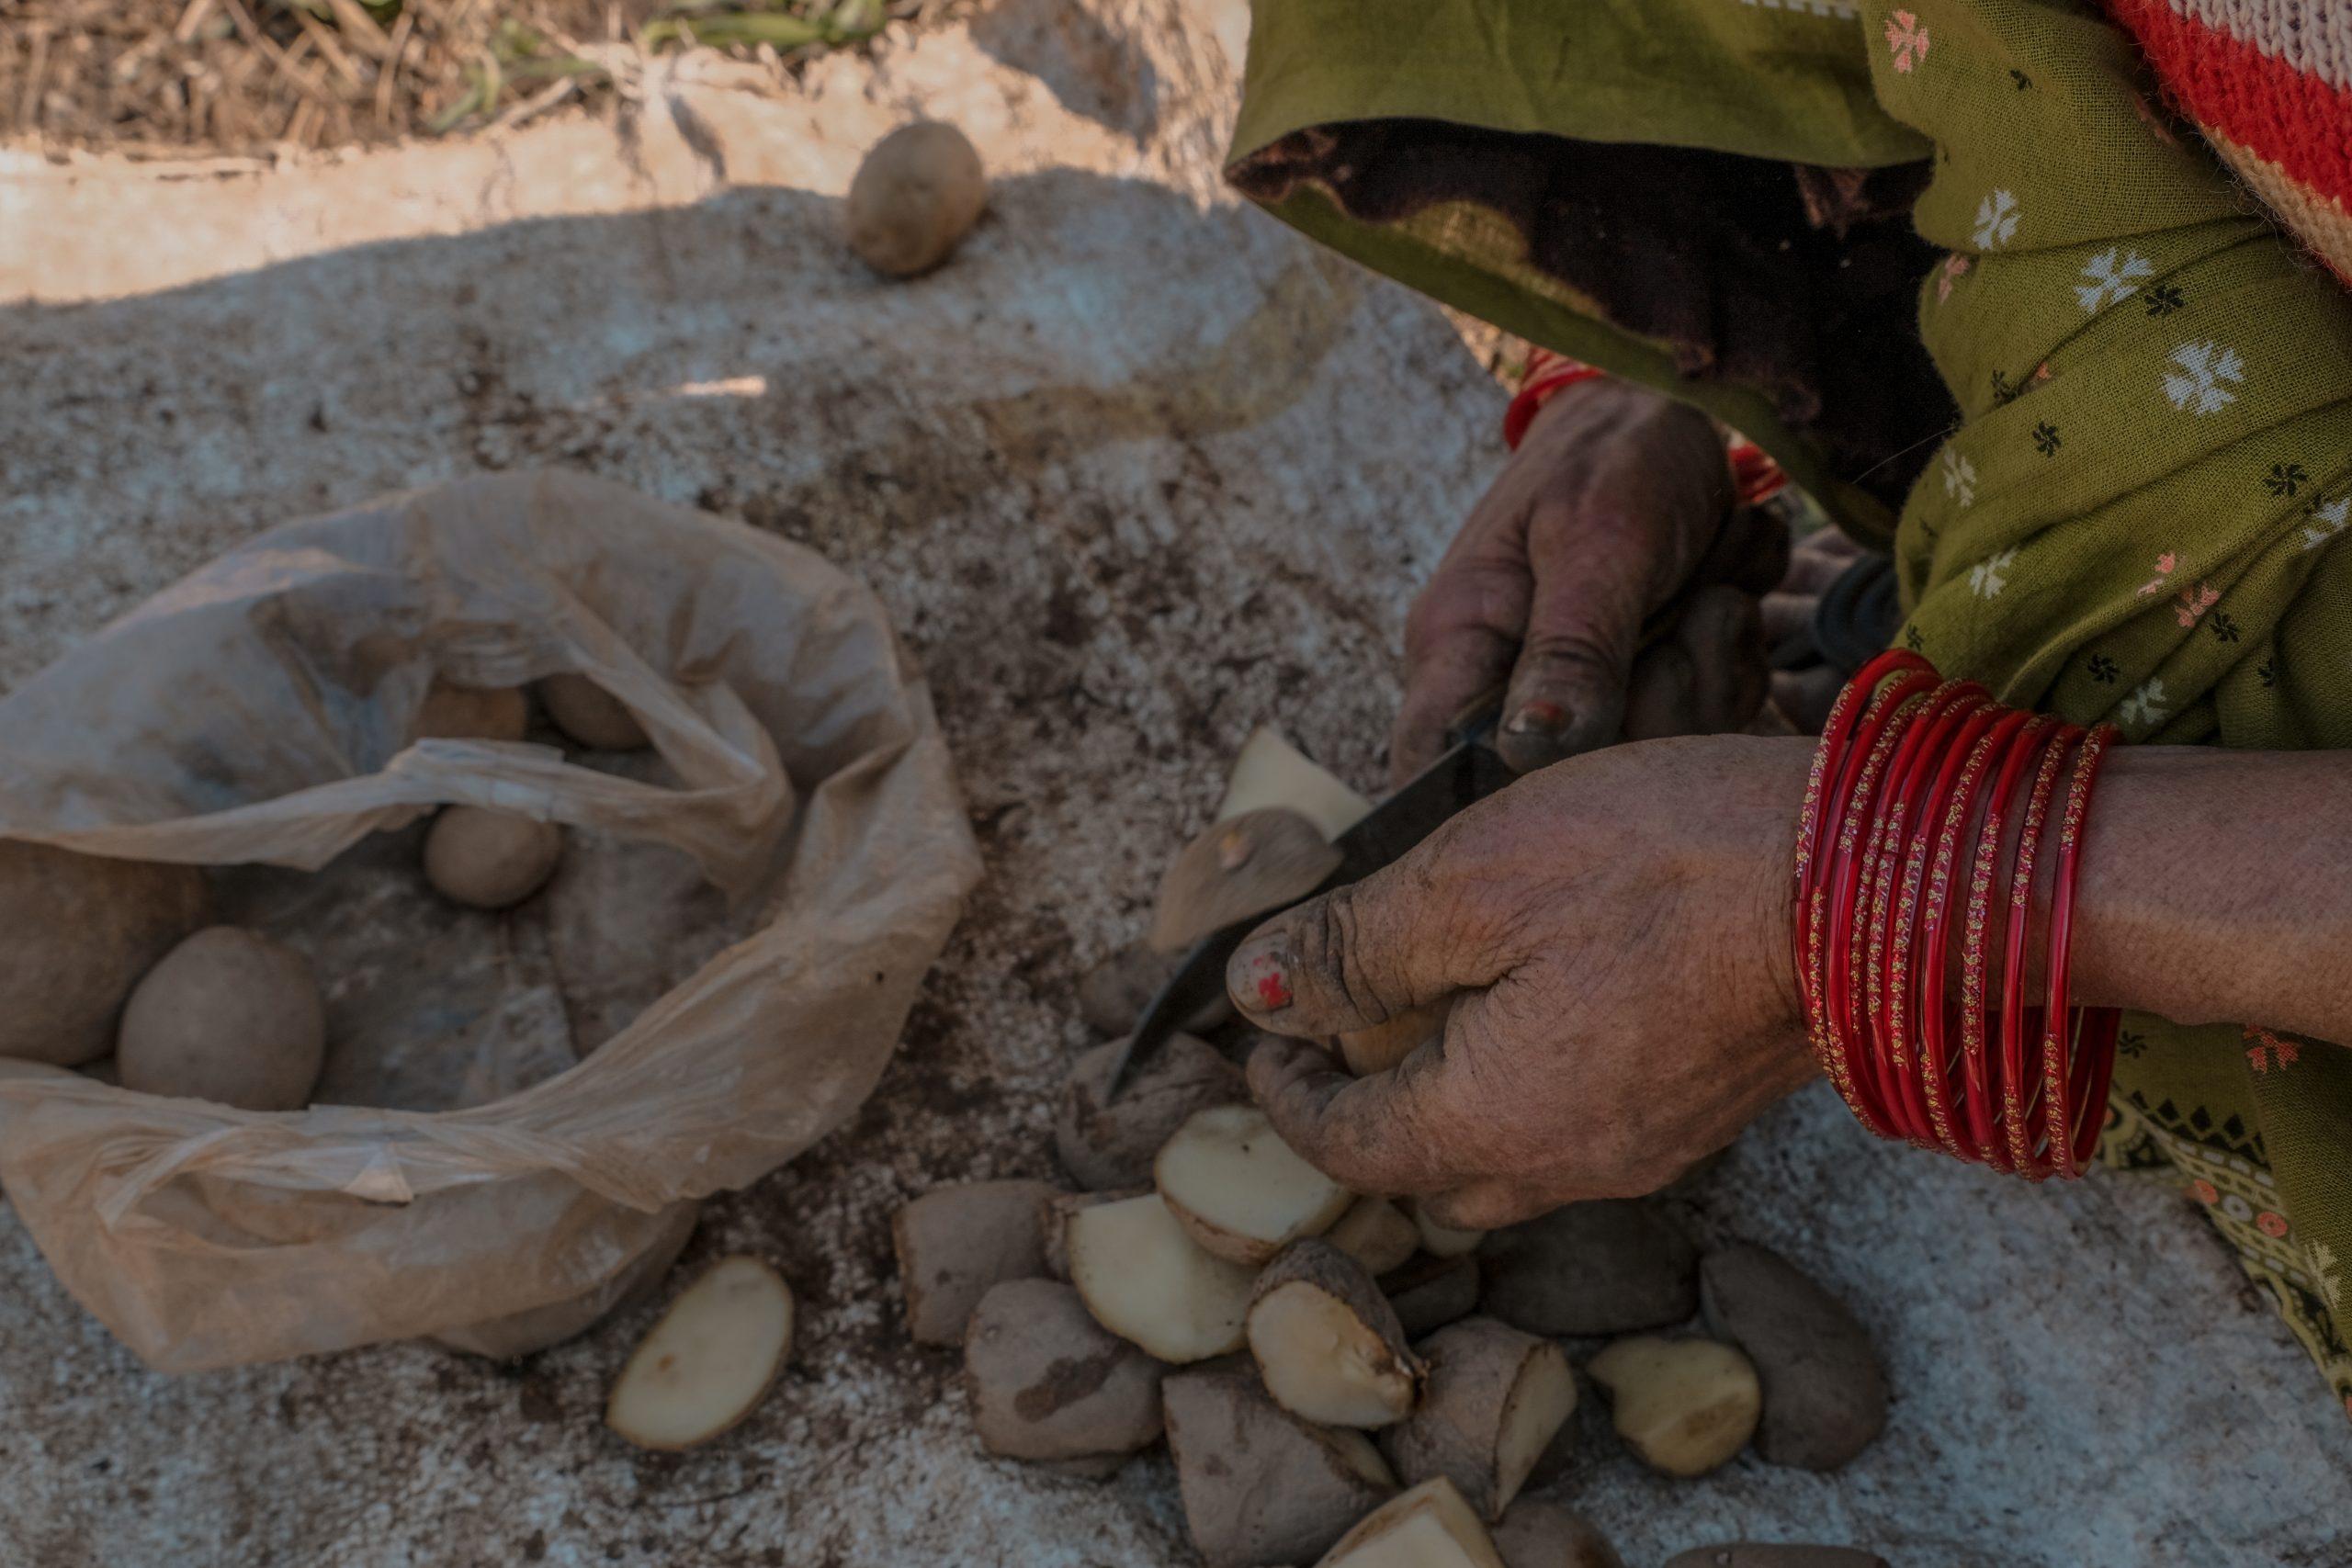 A village woman cutting potatoes